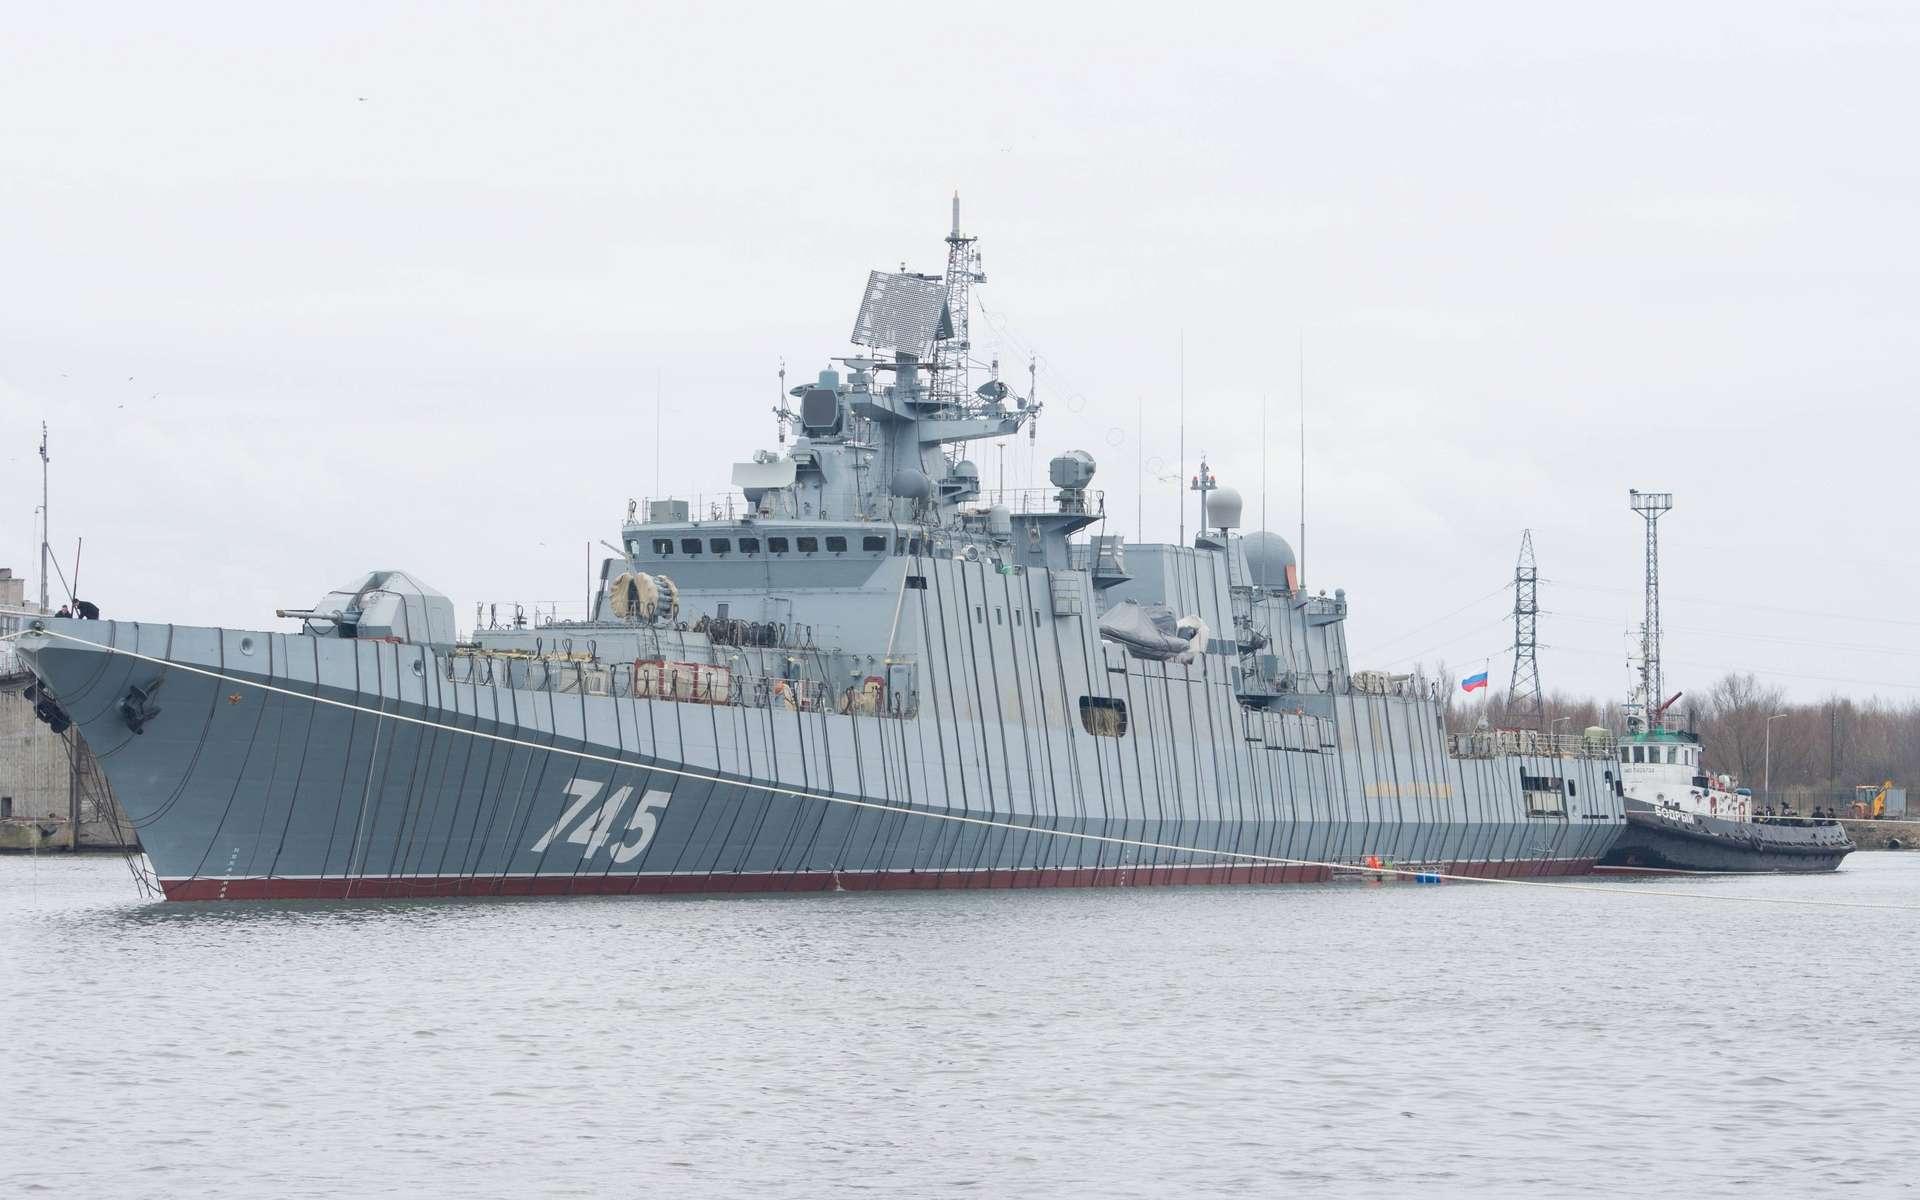 Le navire de guerre Admiral Gorshkov, sur laquelle sera embarquée le Filin 5P-42. © supremecommand, Reddit